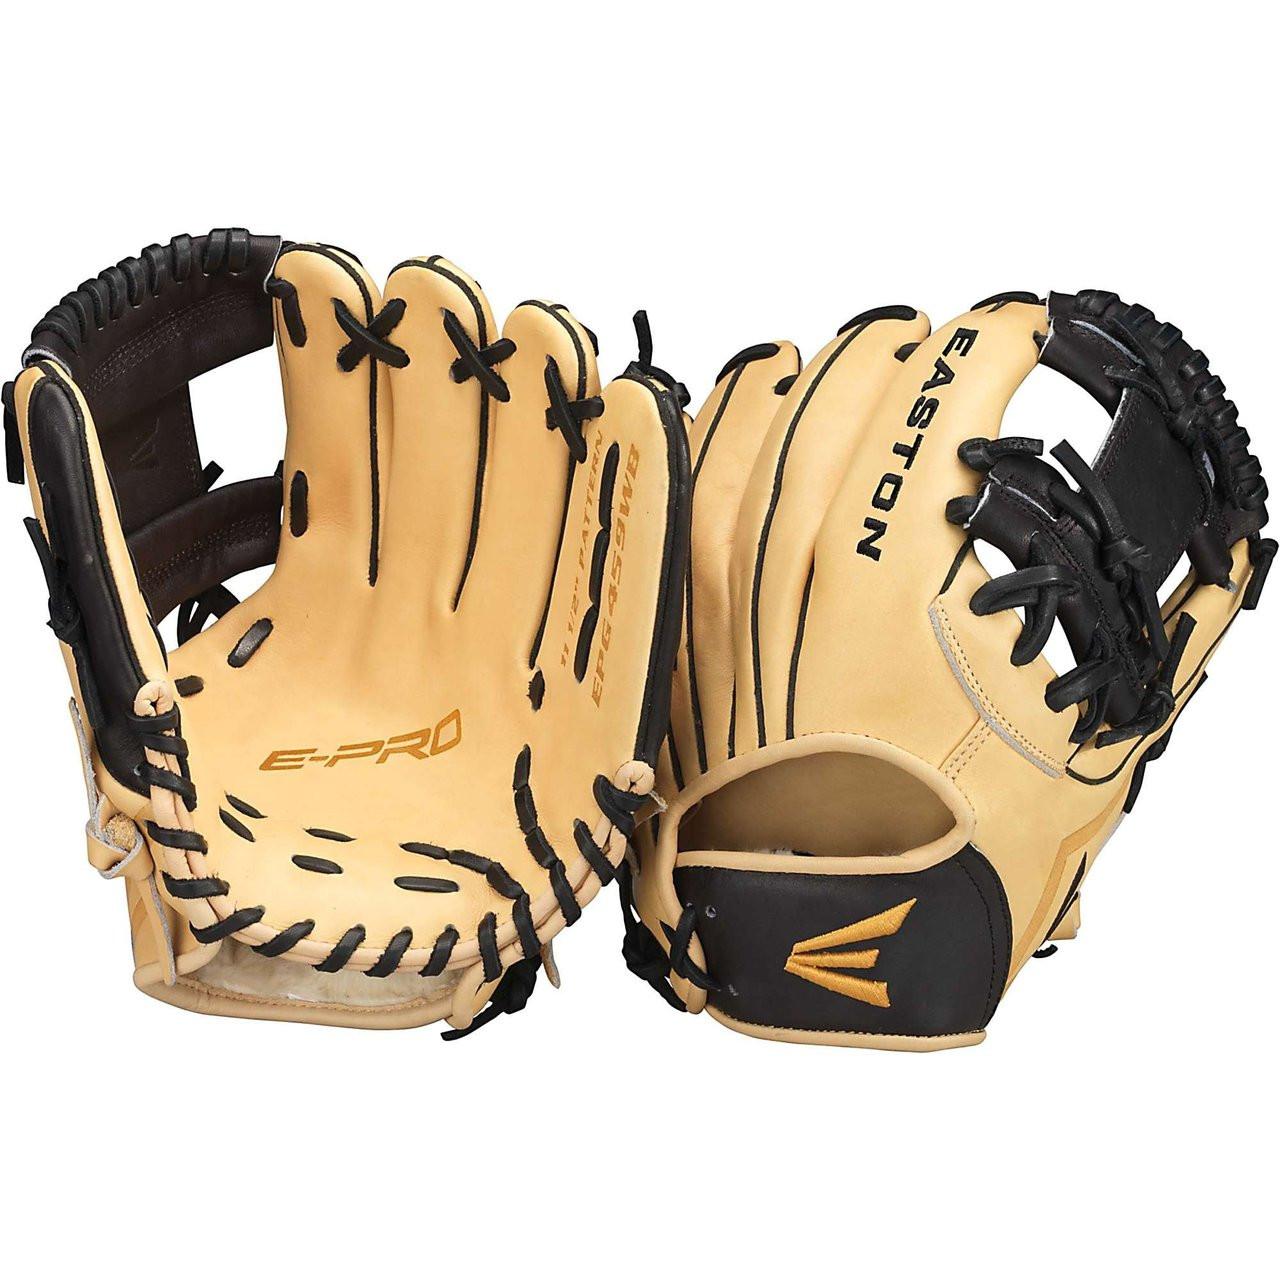 e8fd50ee18a Easton Pro Baseball Glove EPG459WB 11.5 inch (Right Hand Throw)